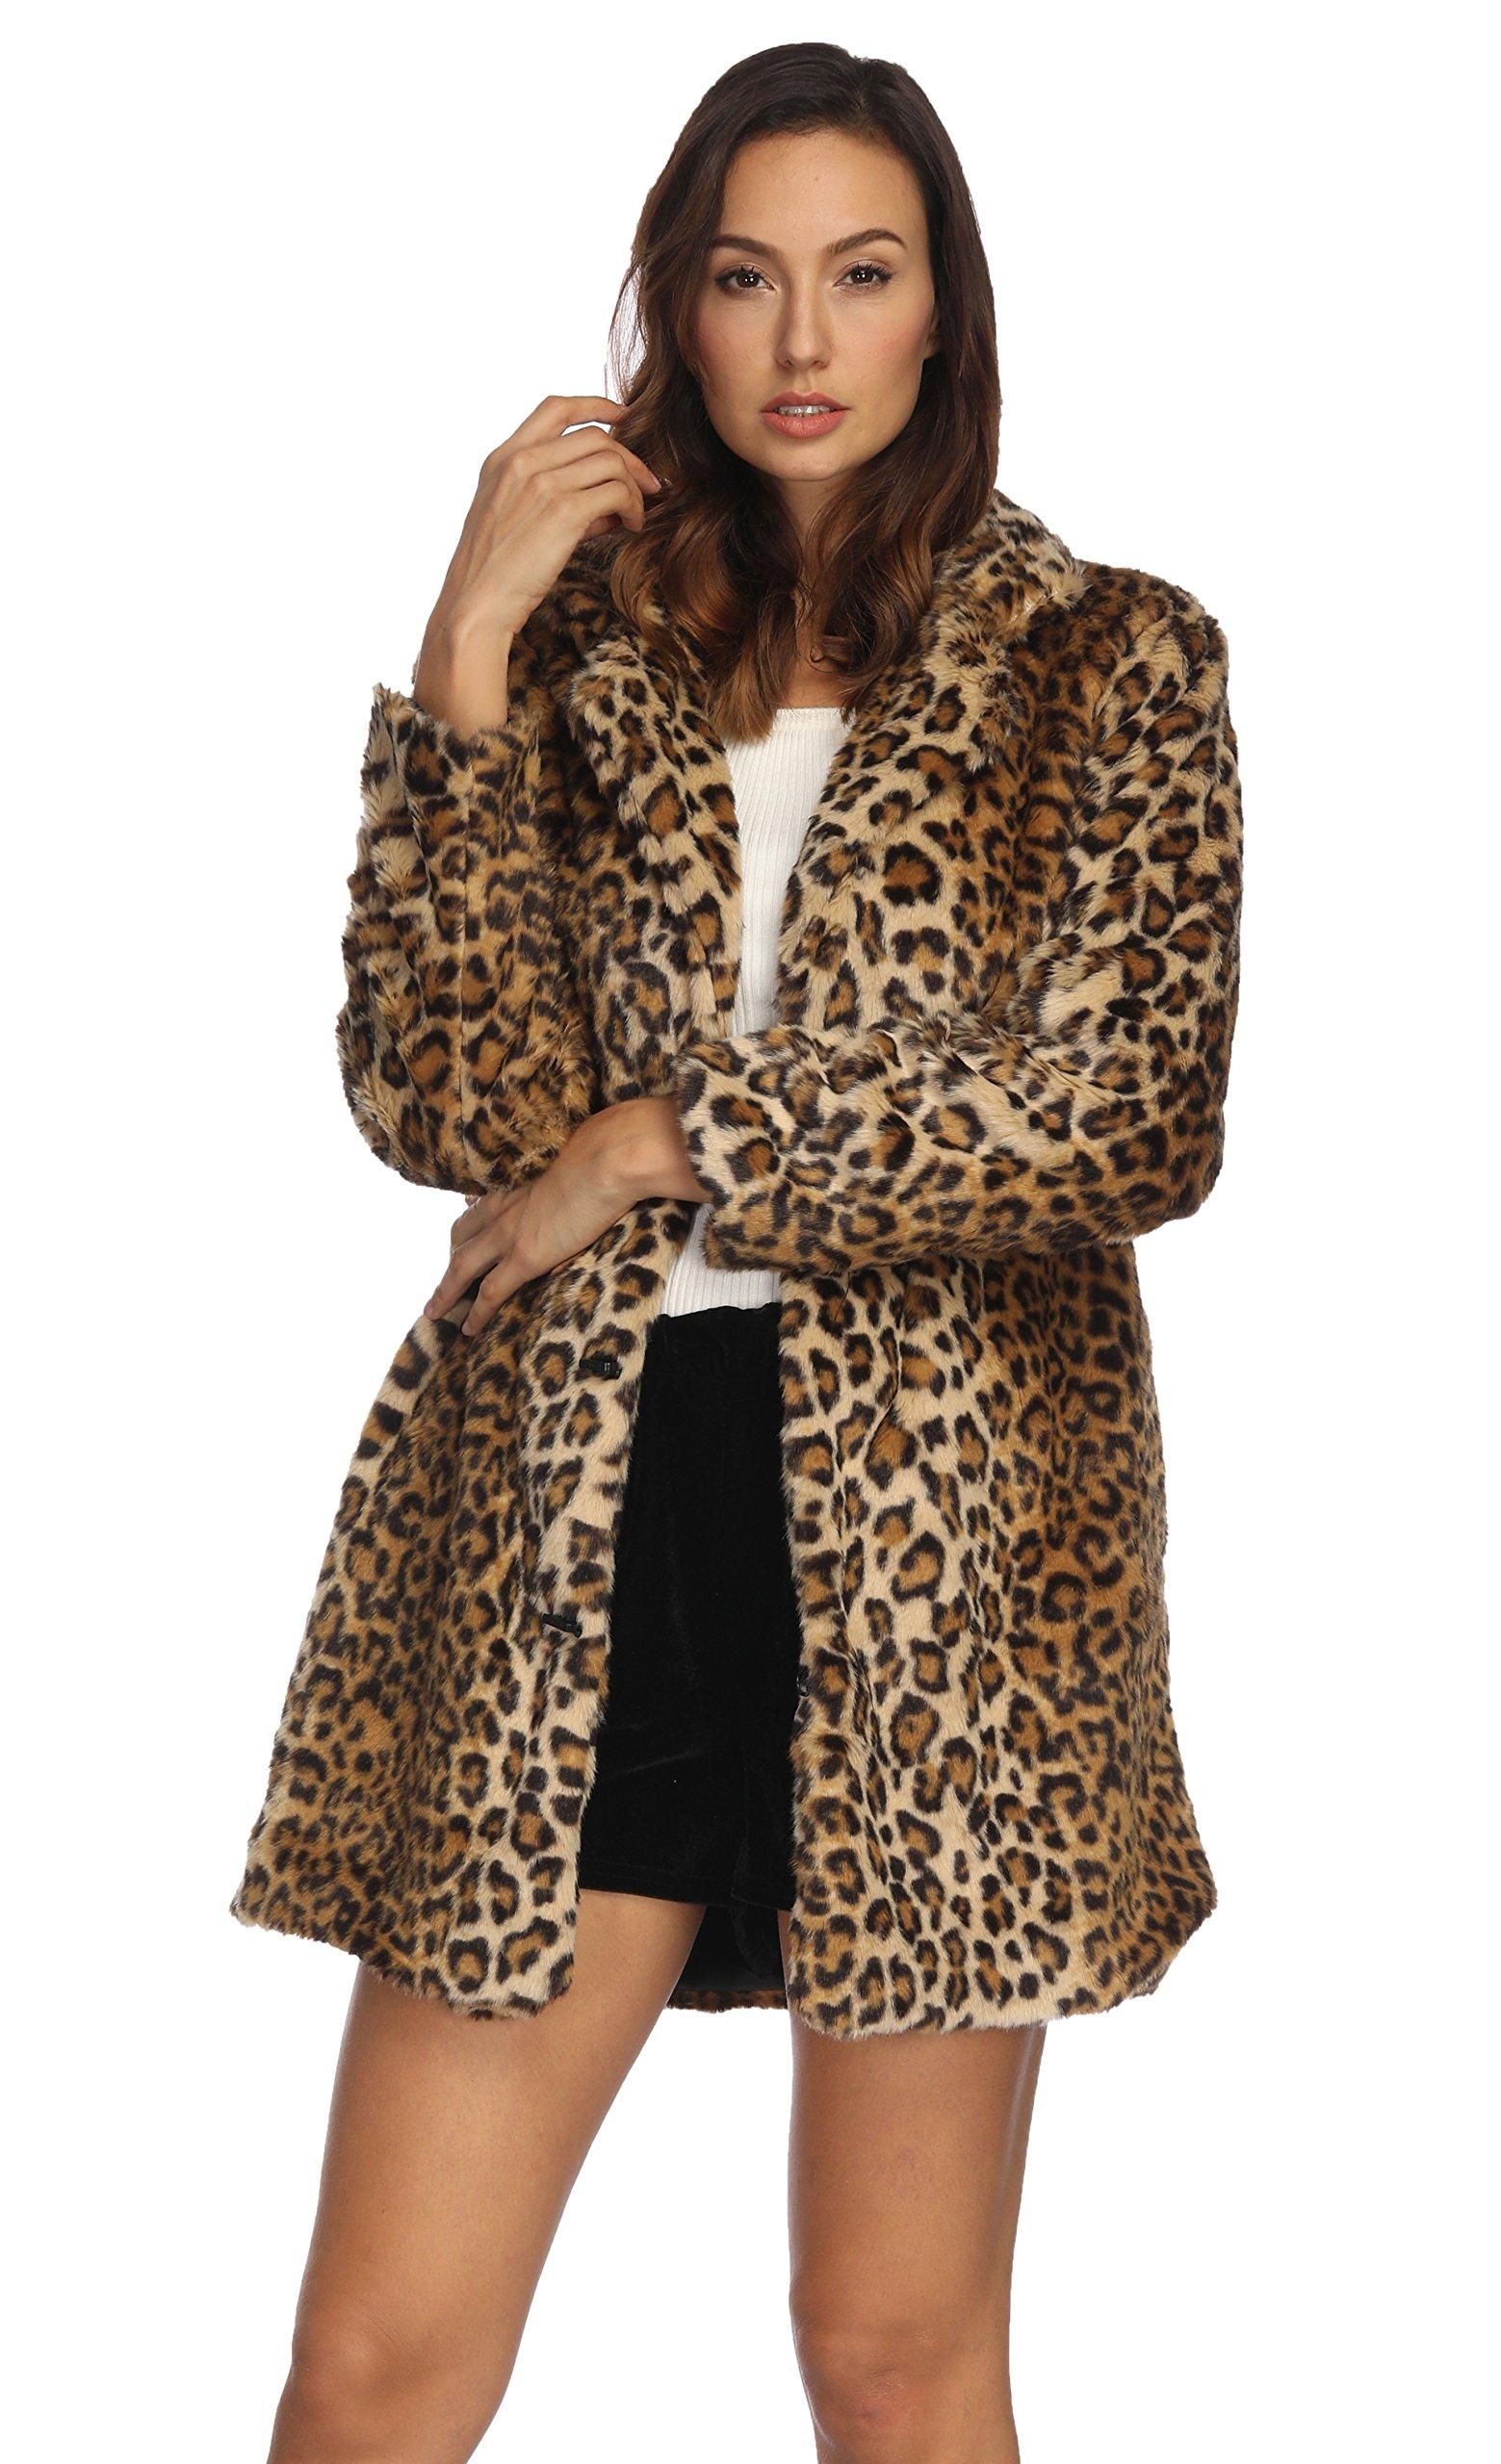 COLINNA Women's Sexy Elegant Vintage Leopard Print Lapel Faux Fur Coat Winter Jacket Outwear (M, Black)